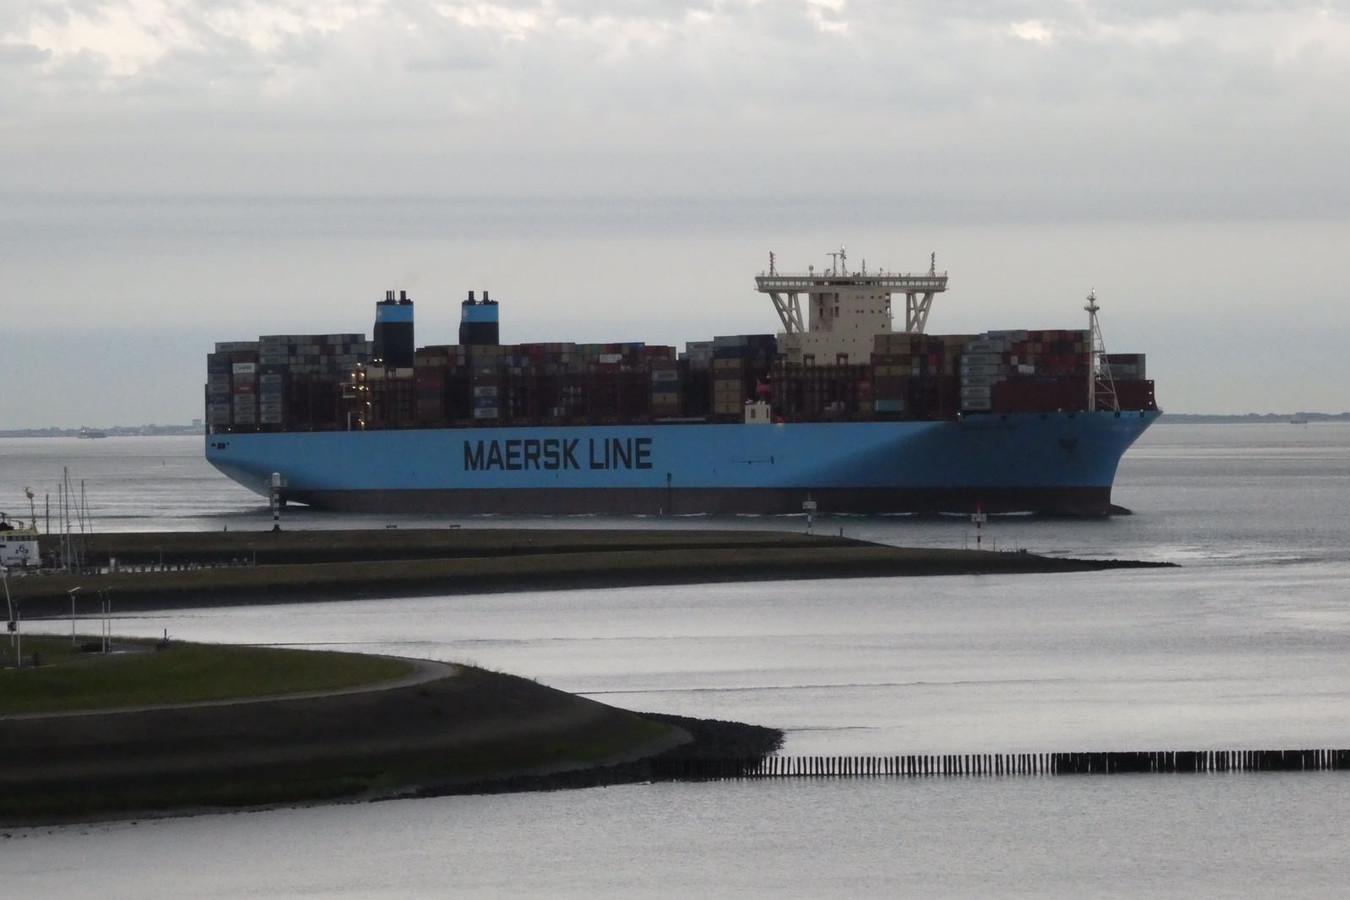 Indrukwekkende Madrid Maersk op de Westerschelde | Foto | AD nl